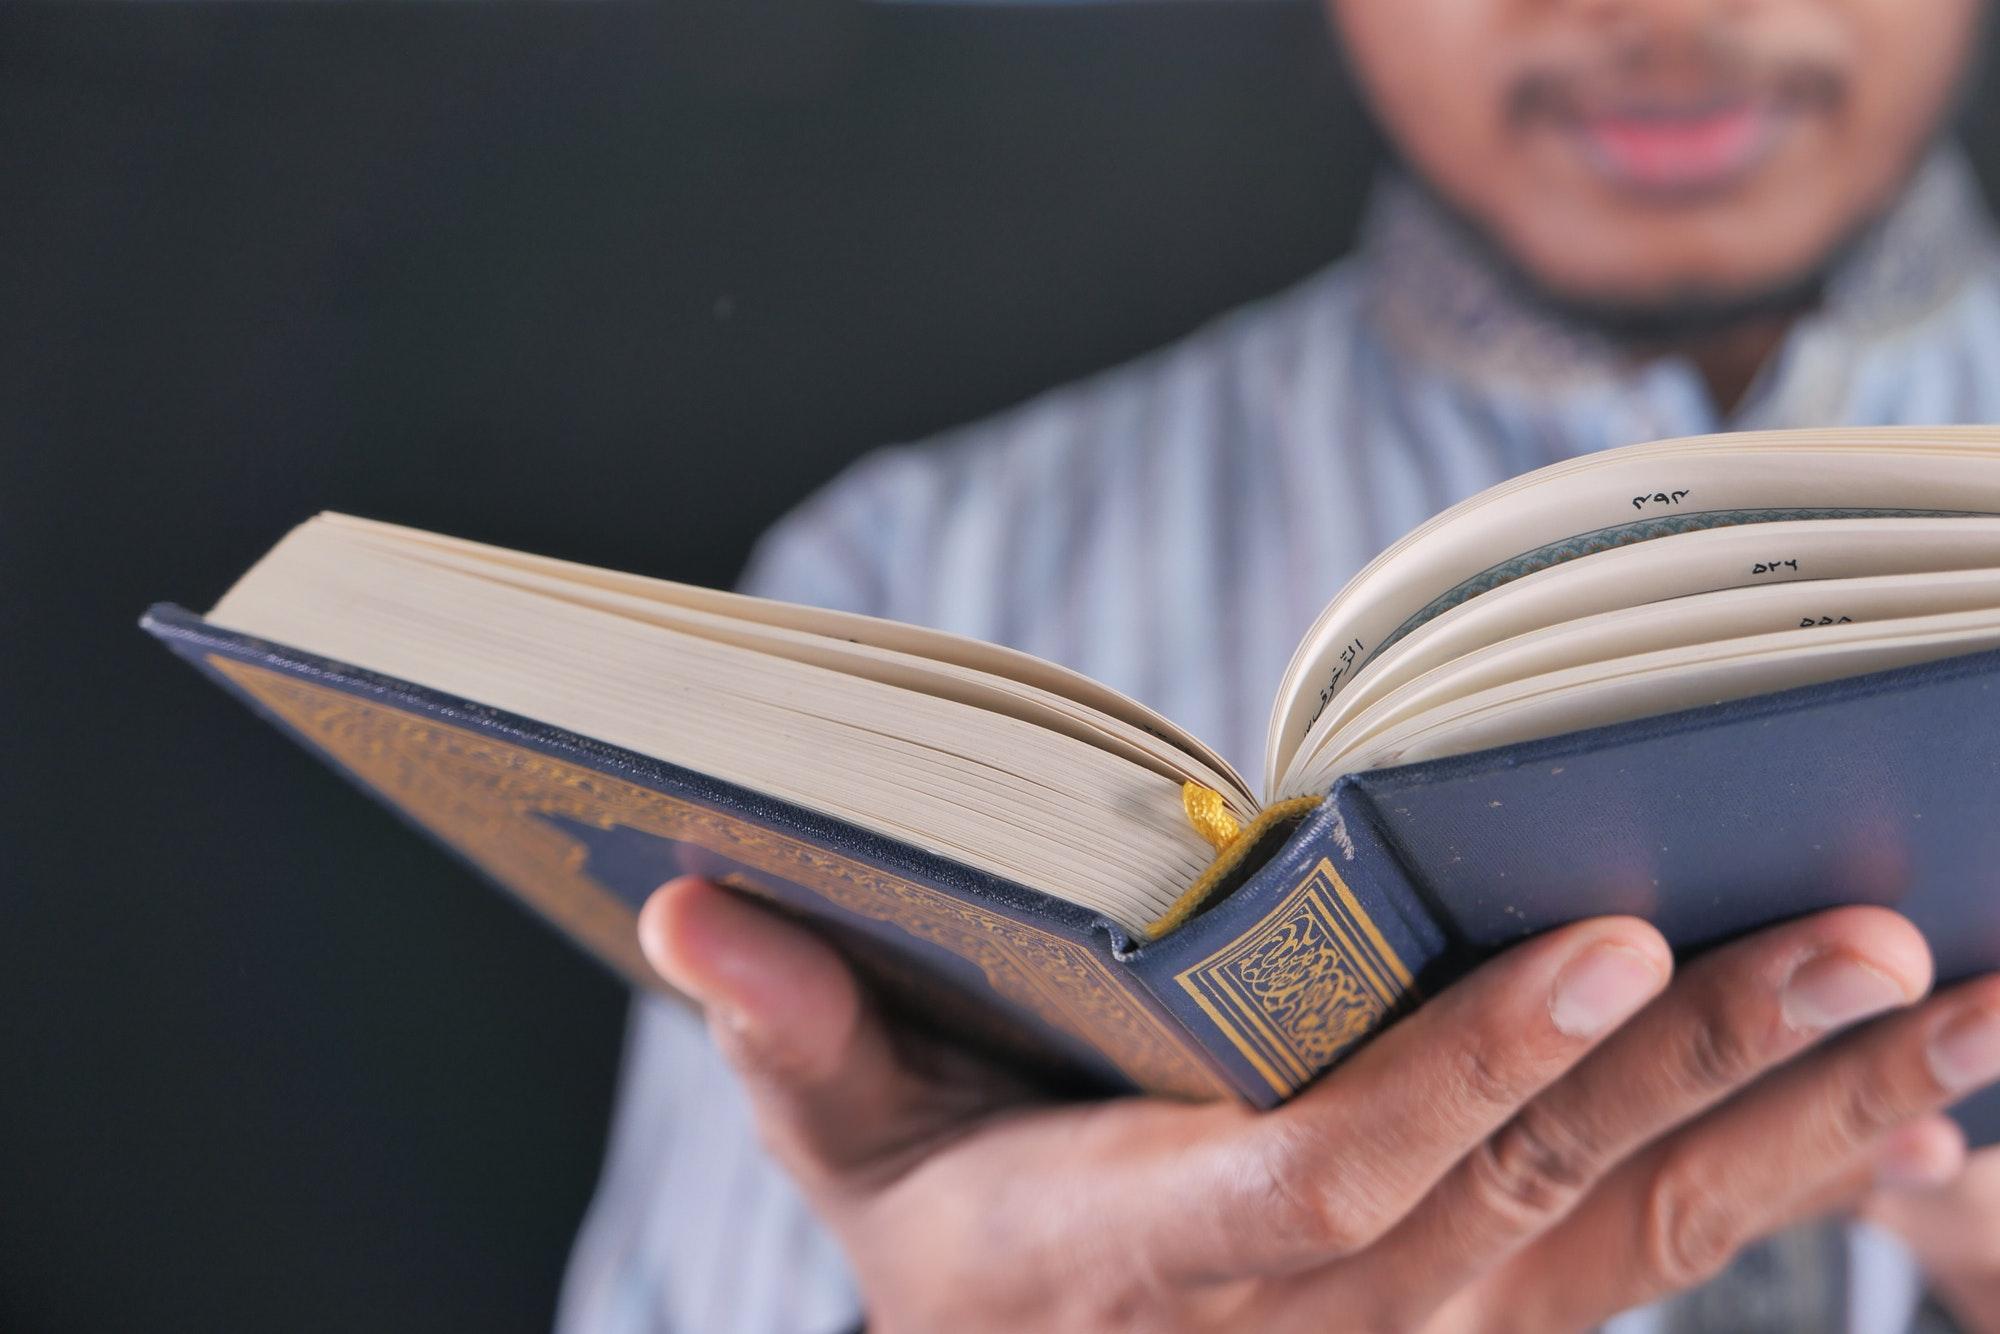 Muslim mans reading quran at night